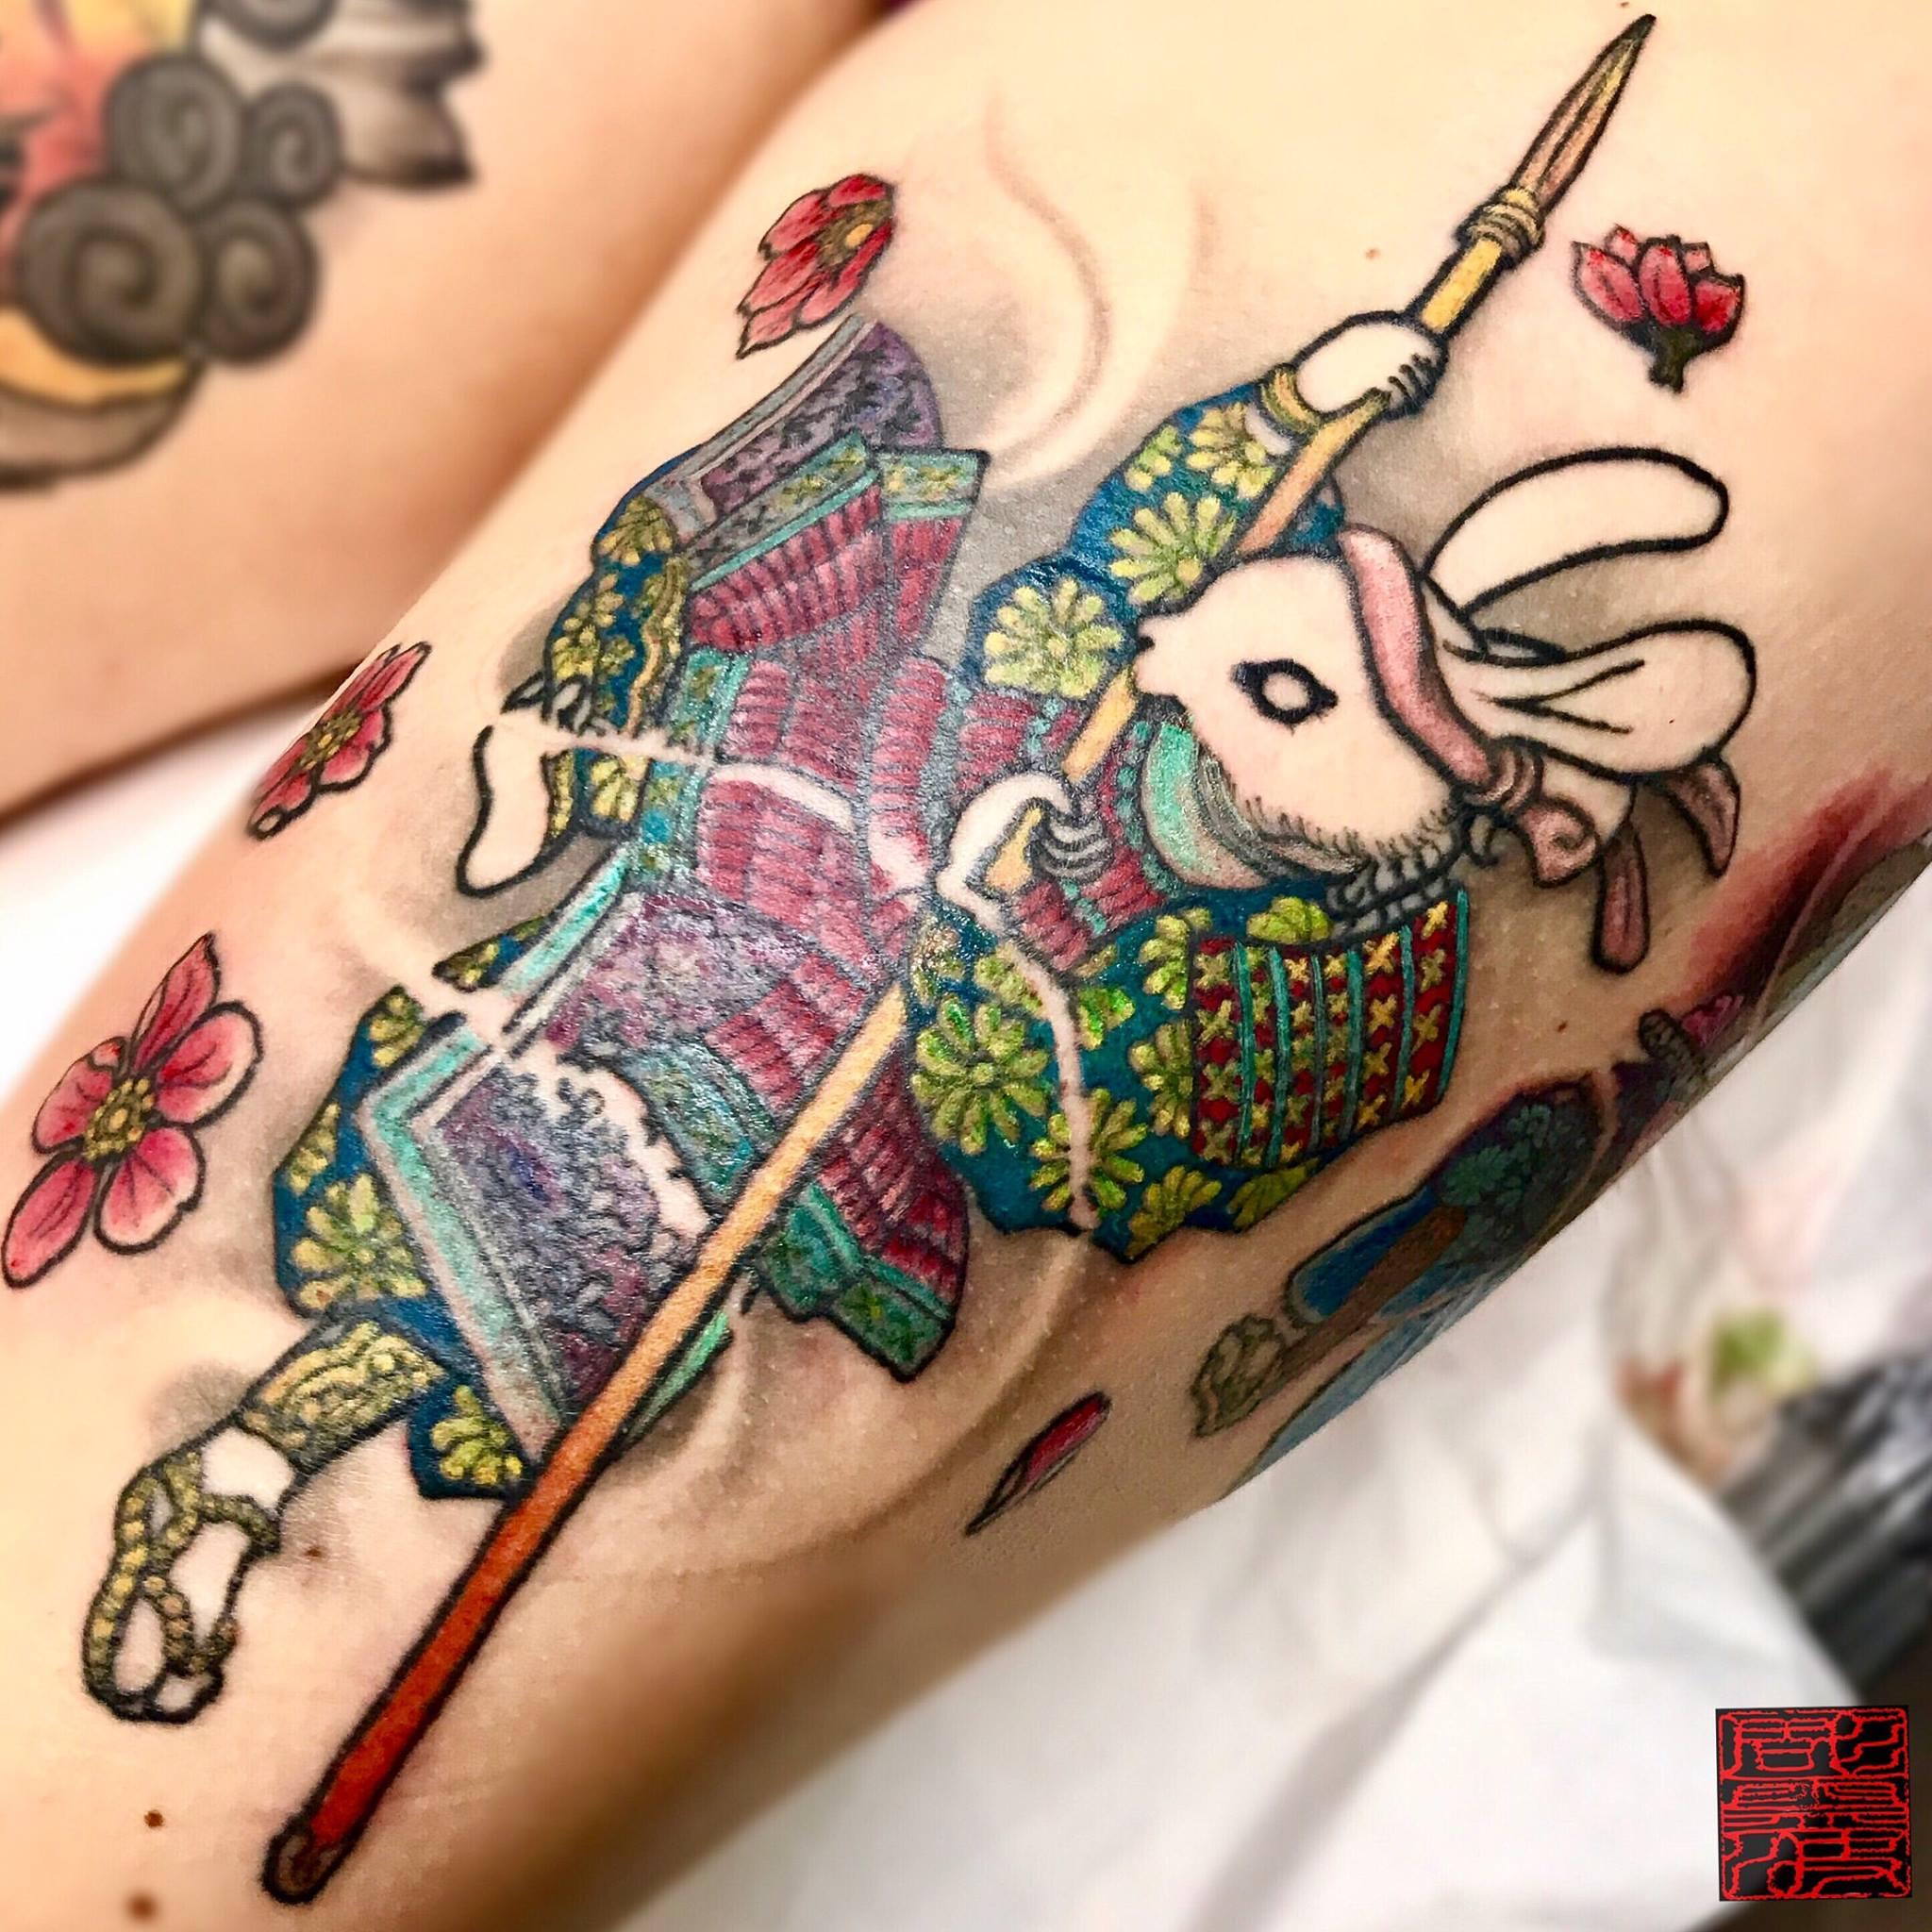 Lepa Dinis (彫霊波) inksearch tattoo